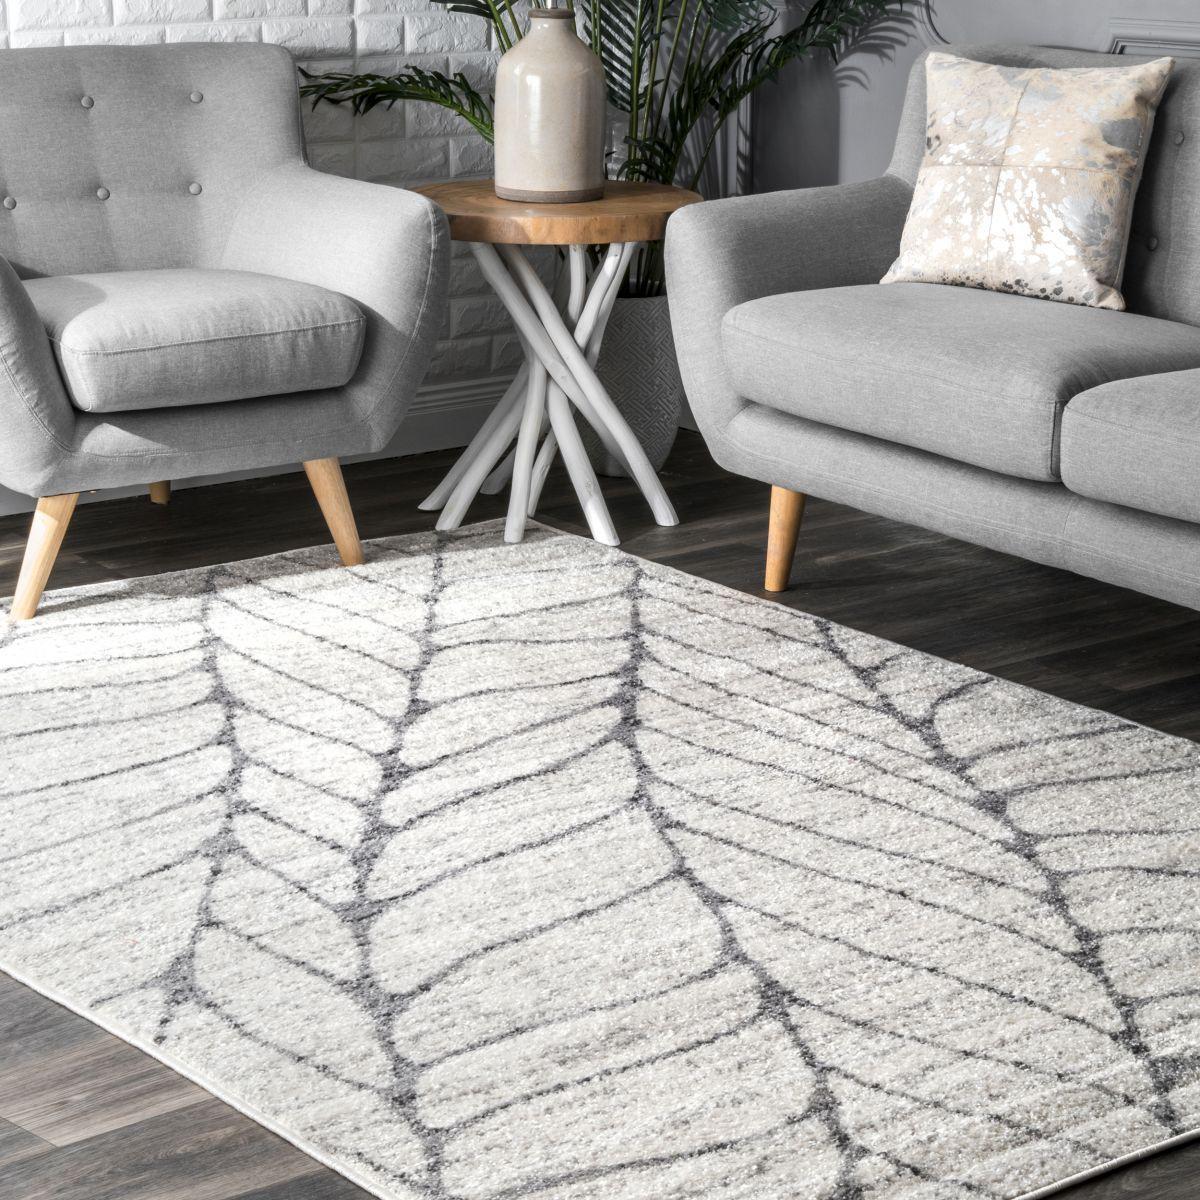 Christy Light Grey Cambridge Leaf Print Towel | Debenhams